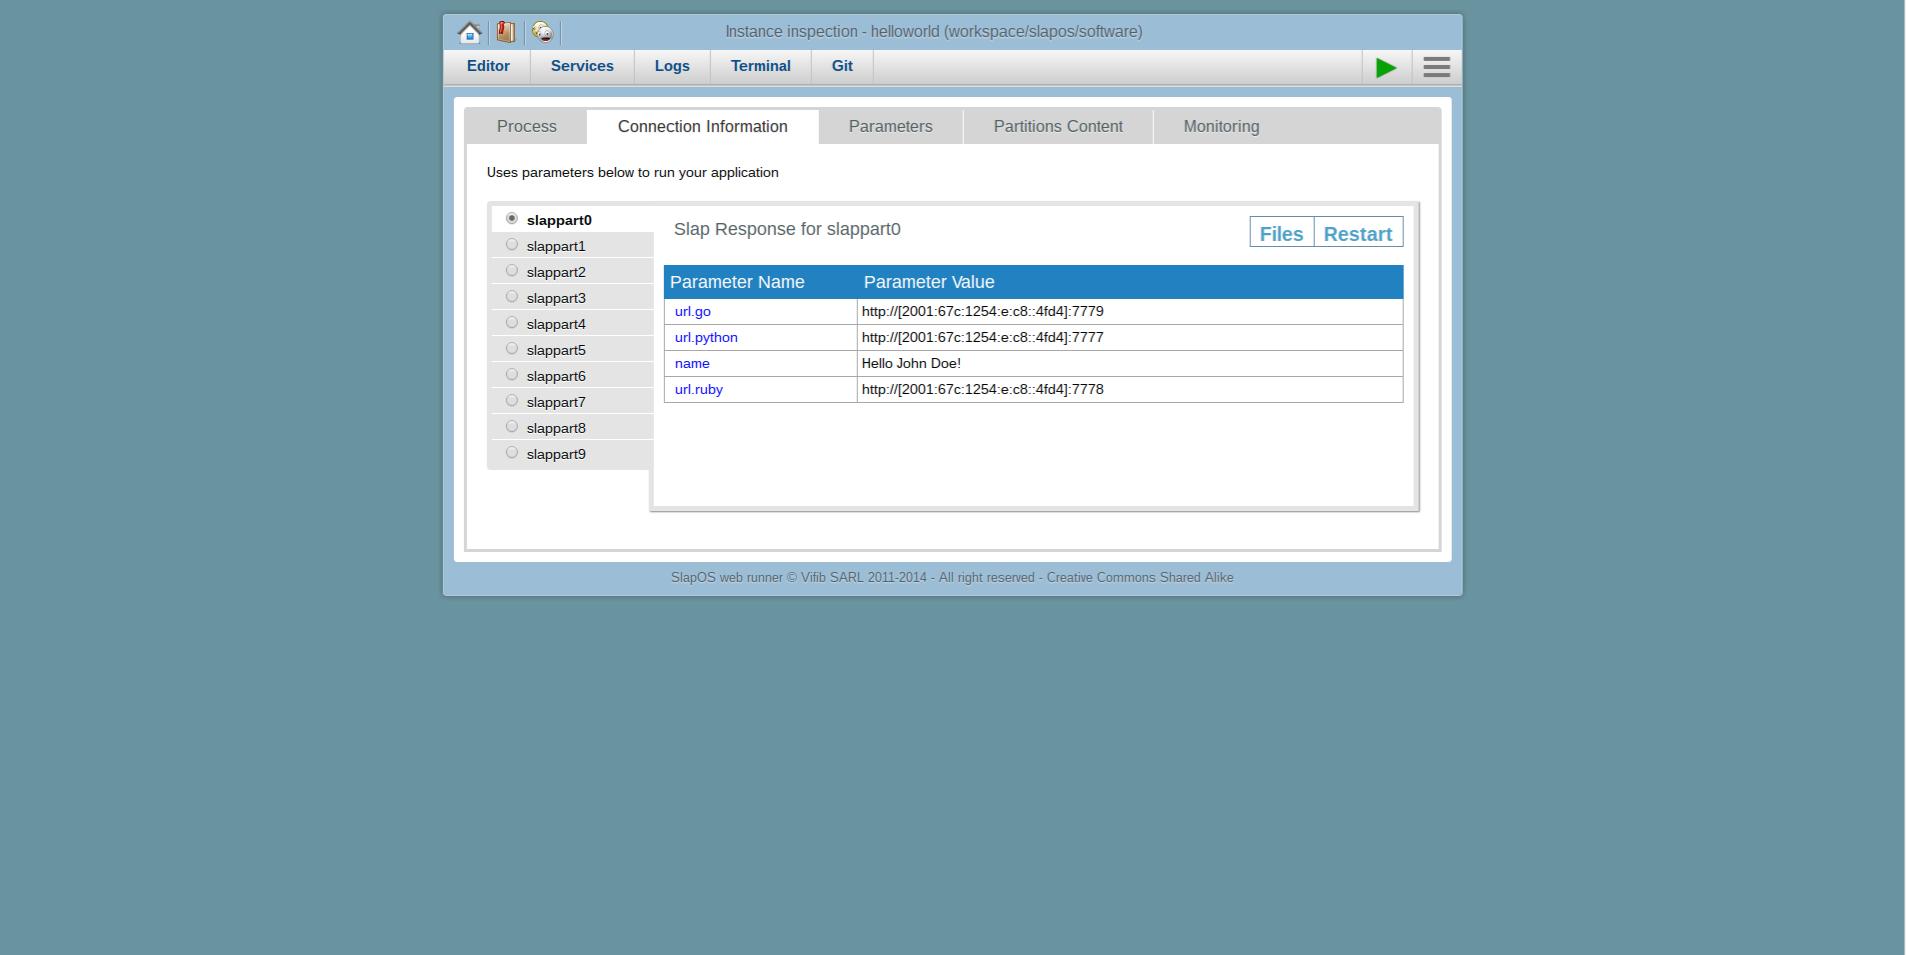 Webrunner Interface - Extending Software Release - Verify Connection Information